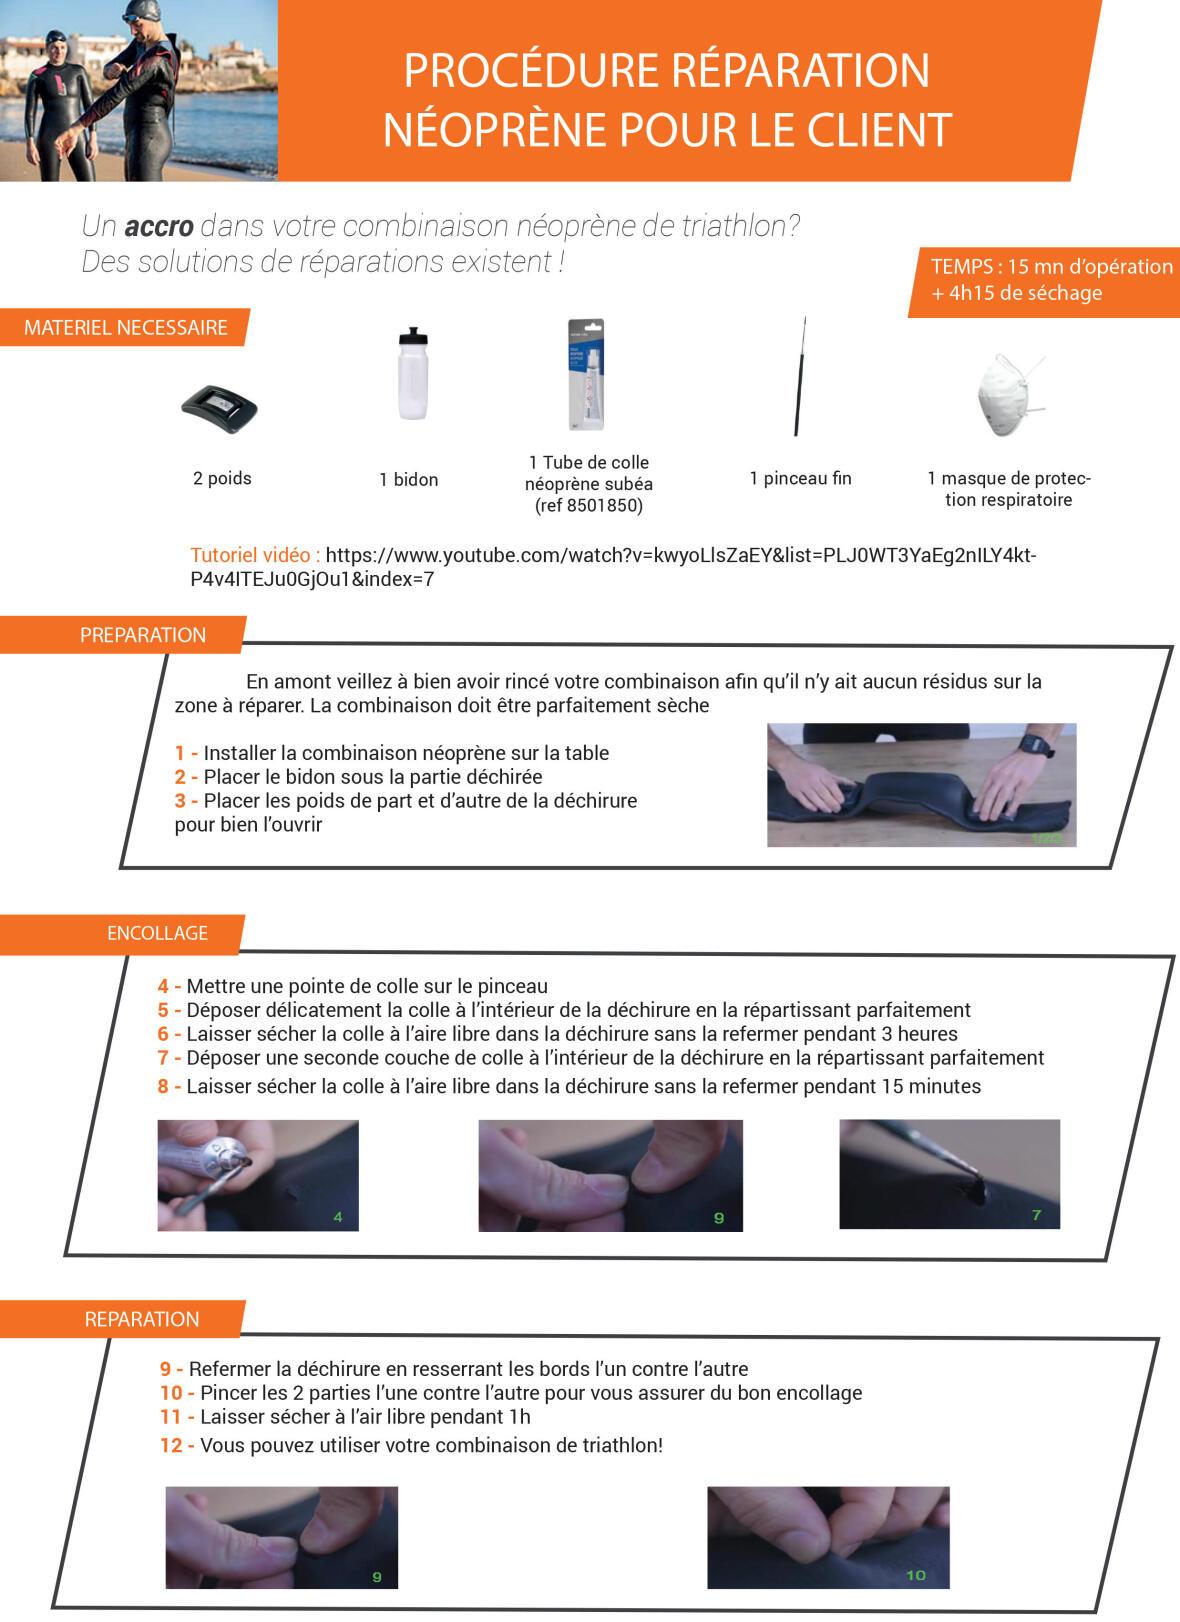 procedure-reparabilite-neoprene